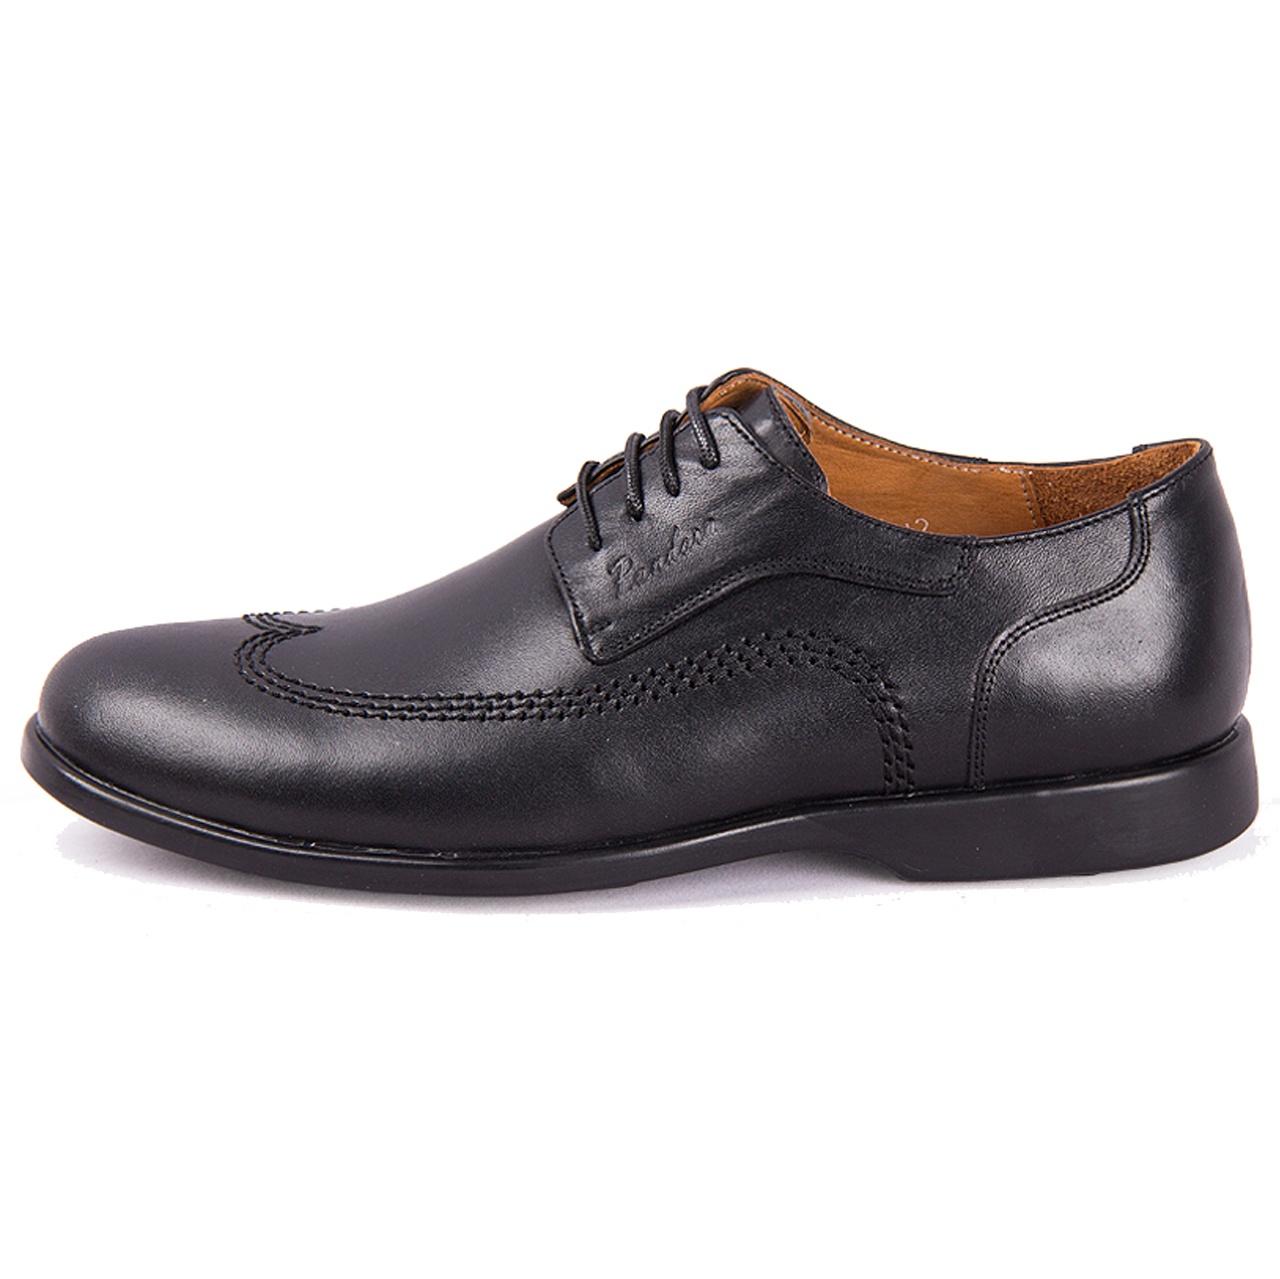 کفش مردانه پاندورا مدل M1804-black